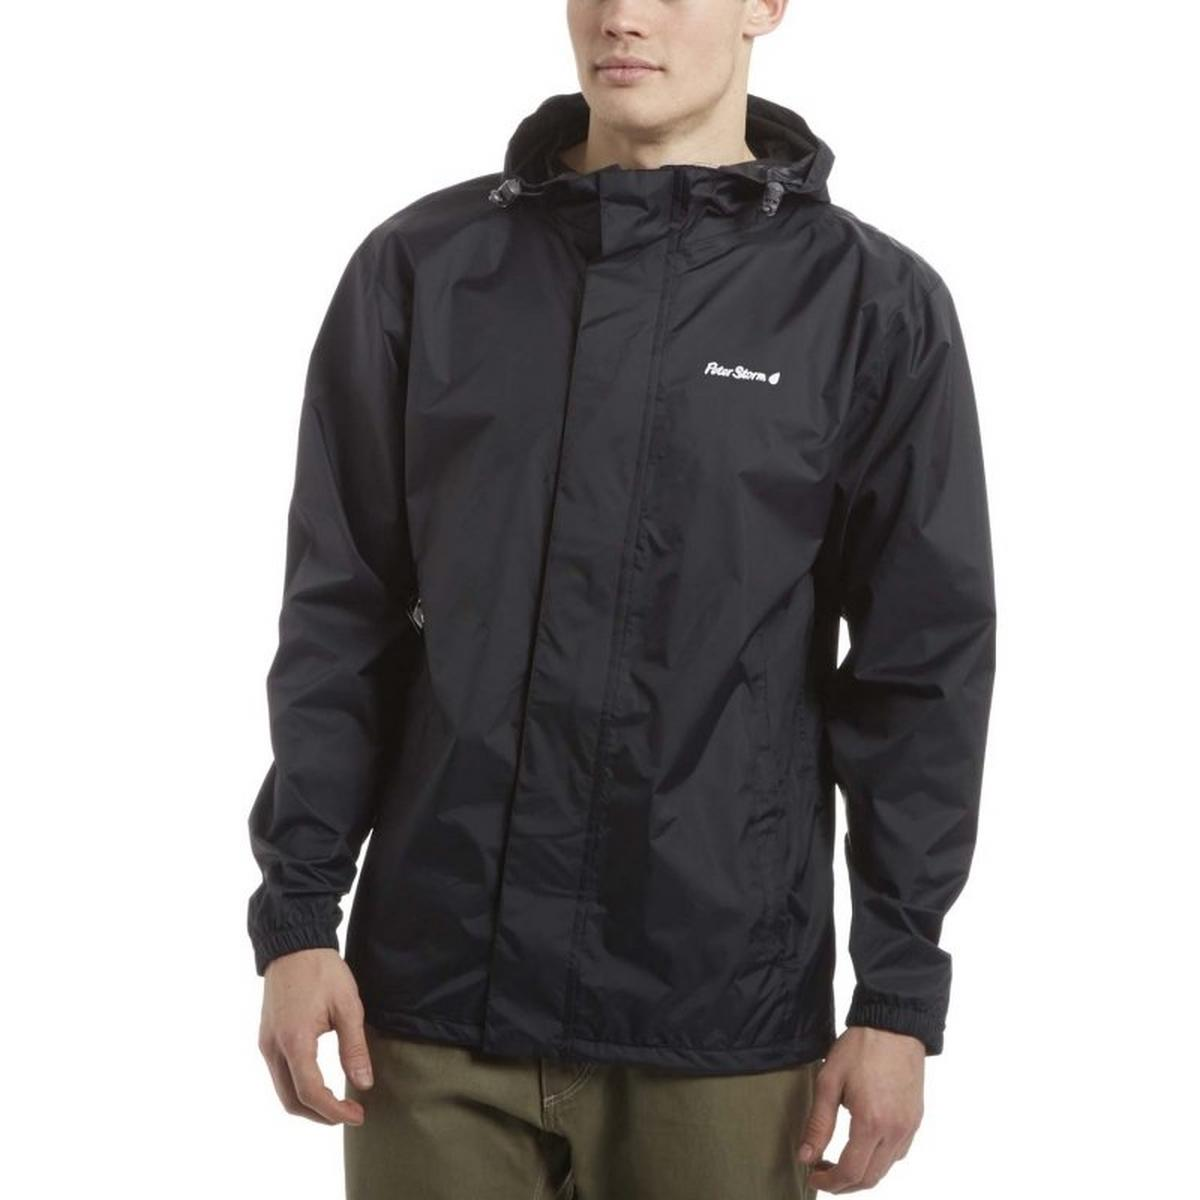 Peter Storm Men's Packable Waterproof Jacket - Black